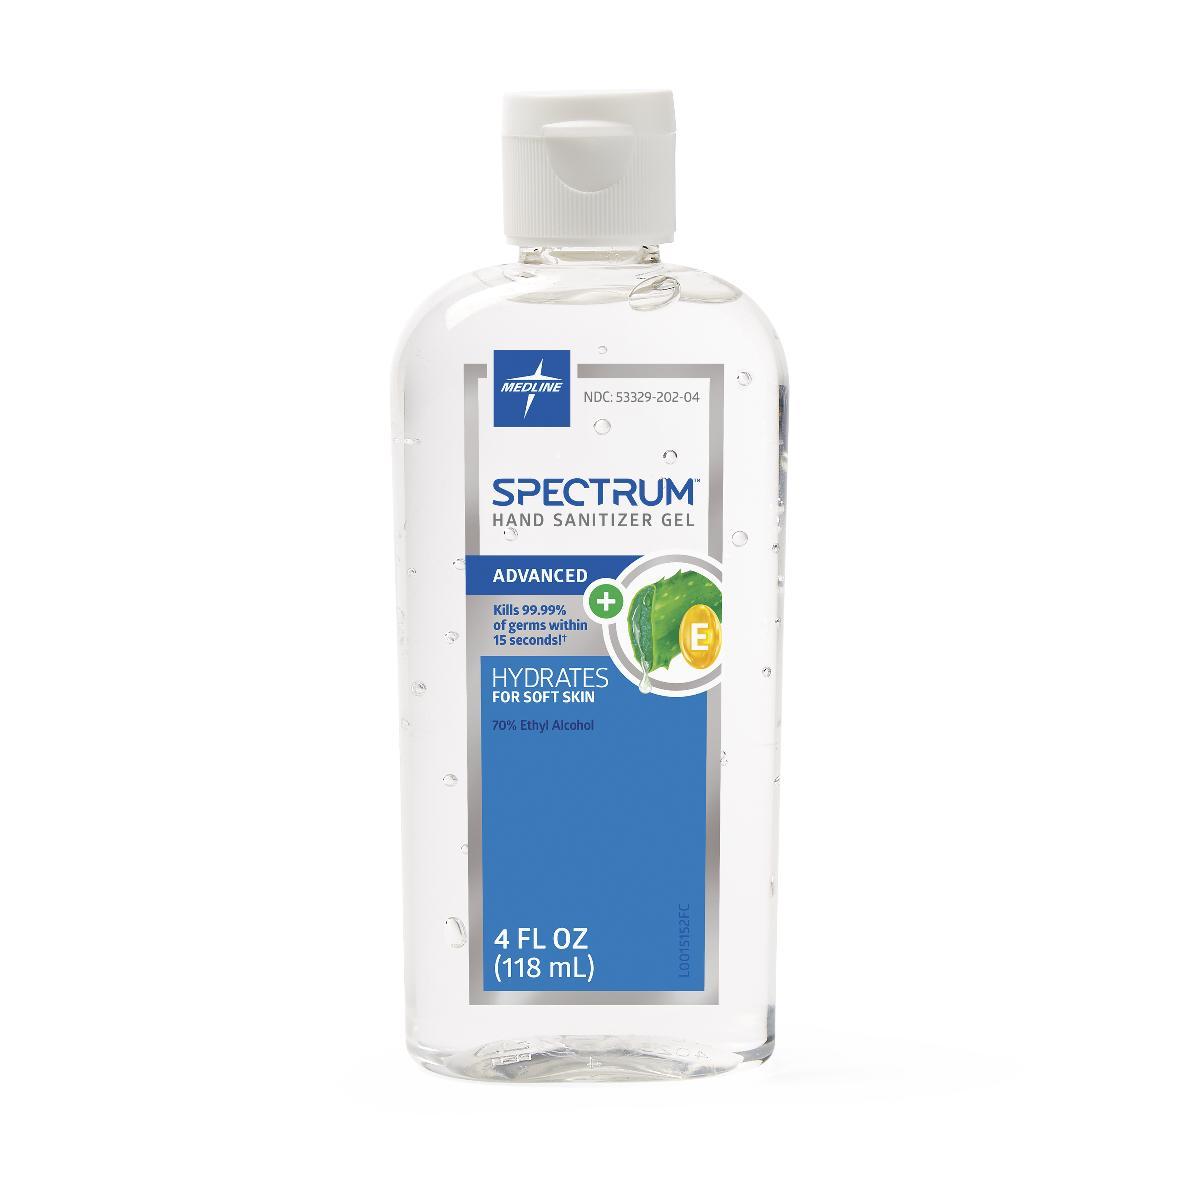 Image Of Spectrum Gel Hand Sanitizer with 70% Ethyl Alcohol, 4 oz.